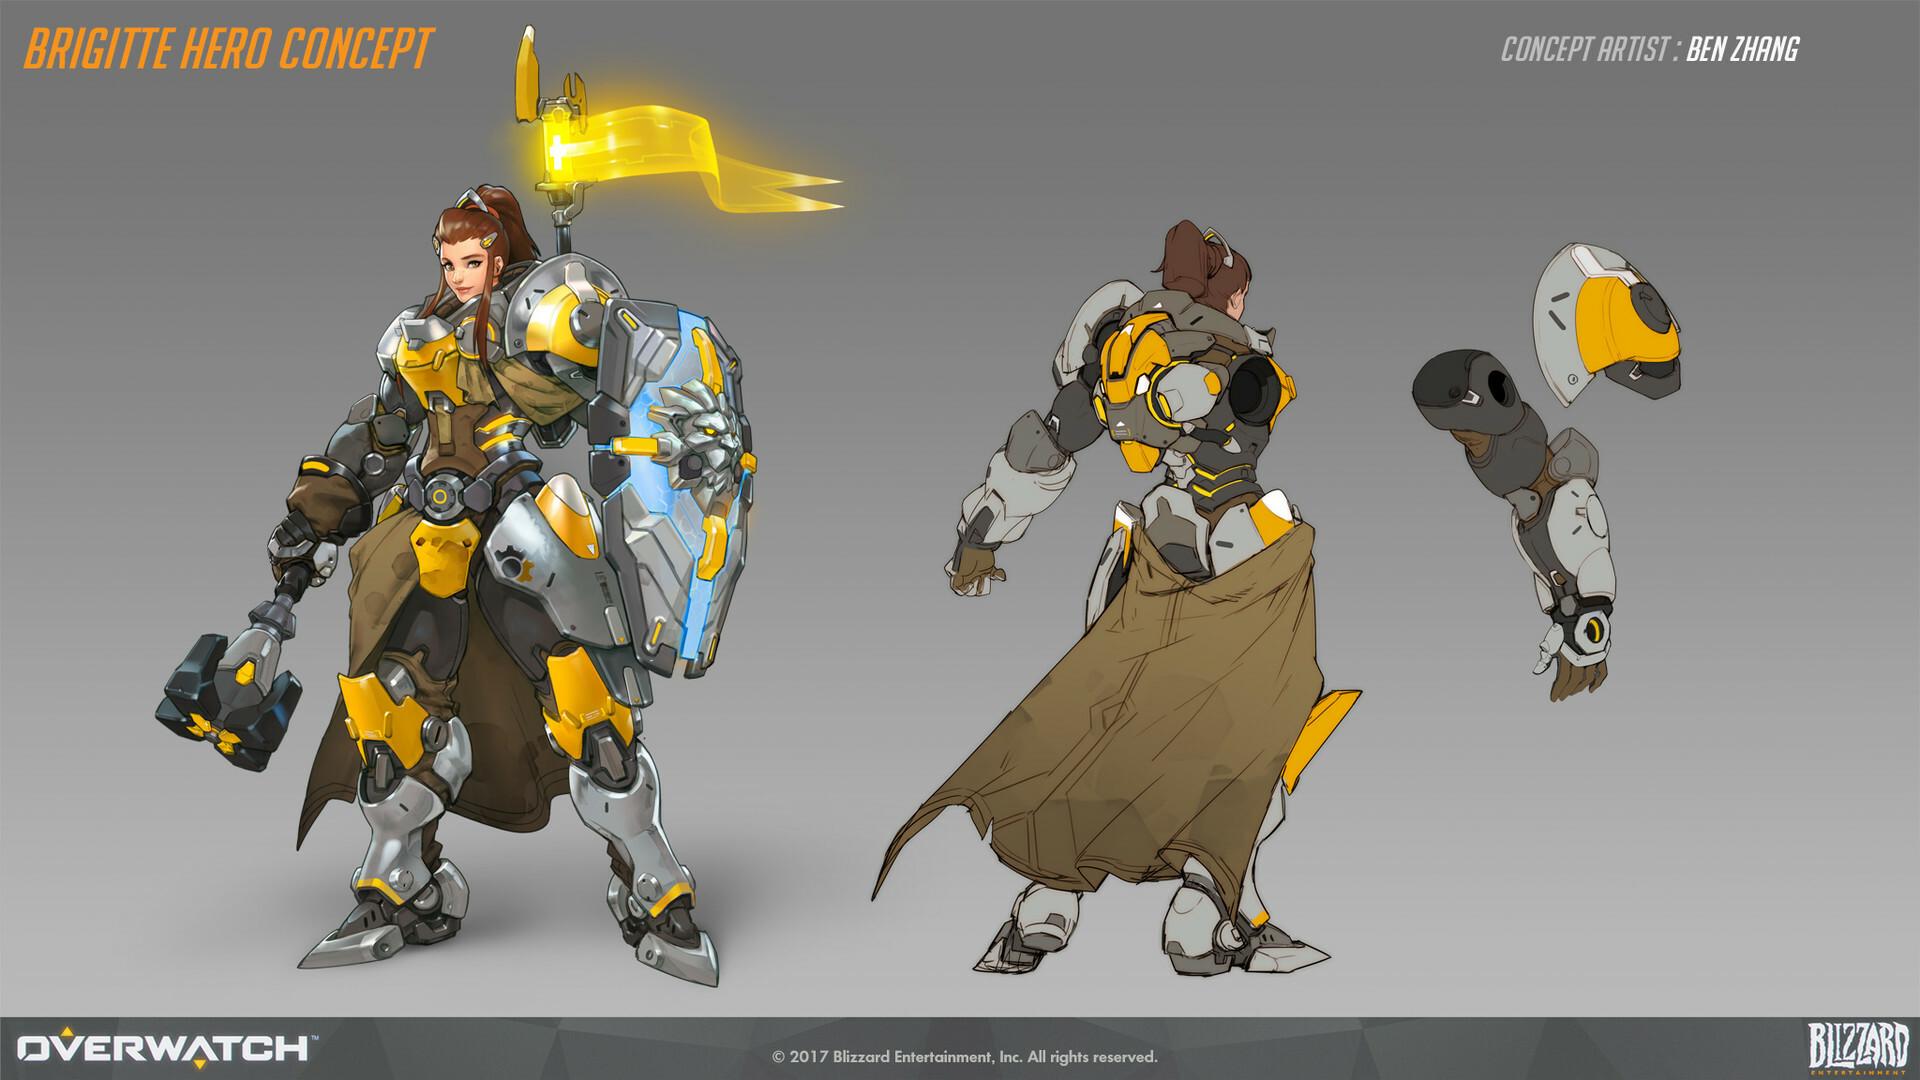 amazing concept by Ben Zhang